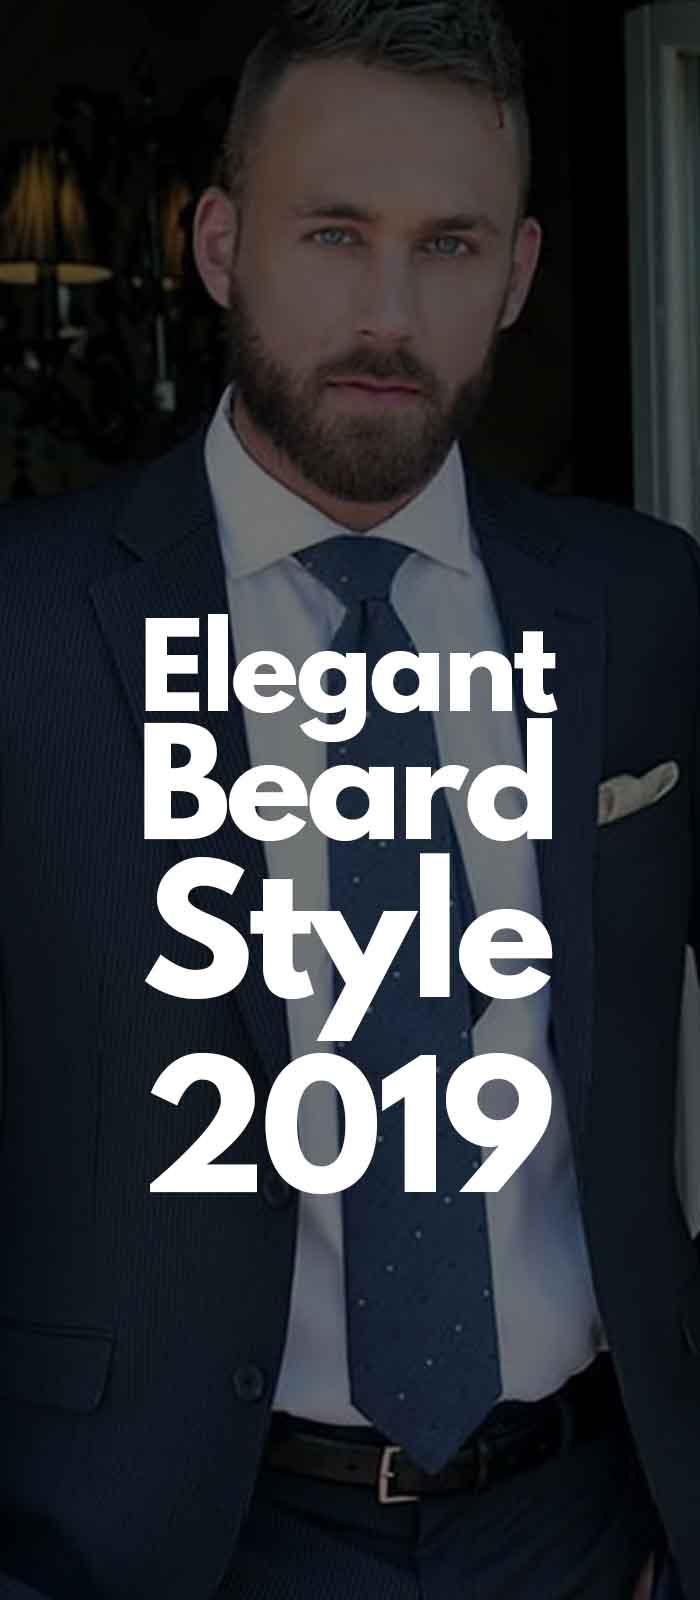 Blue Suit Professional Beard Look!